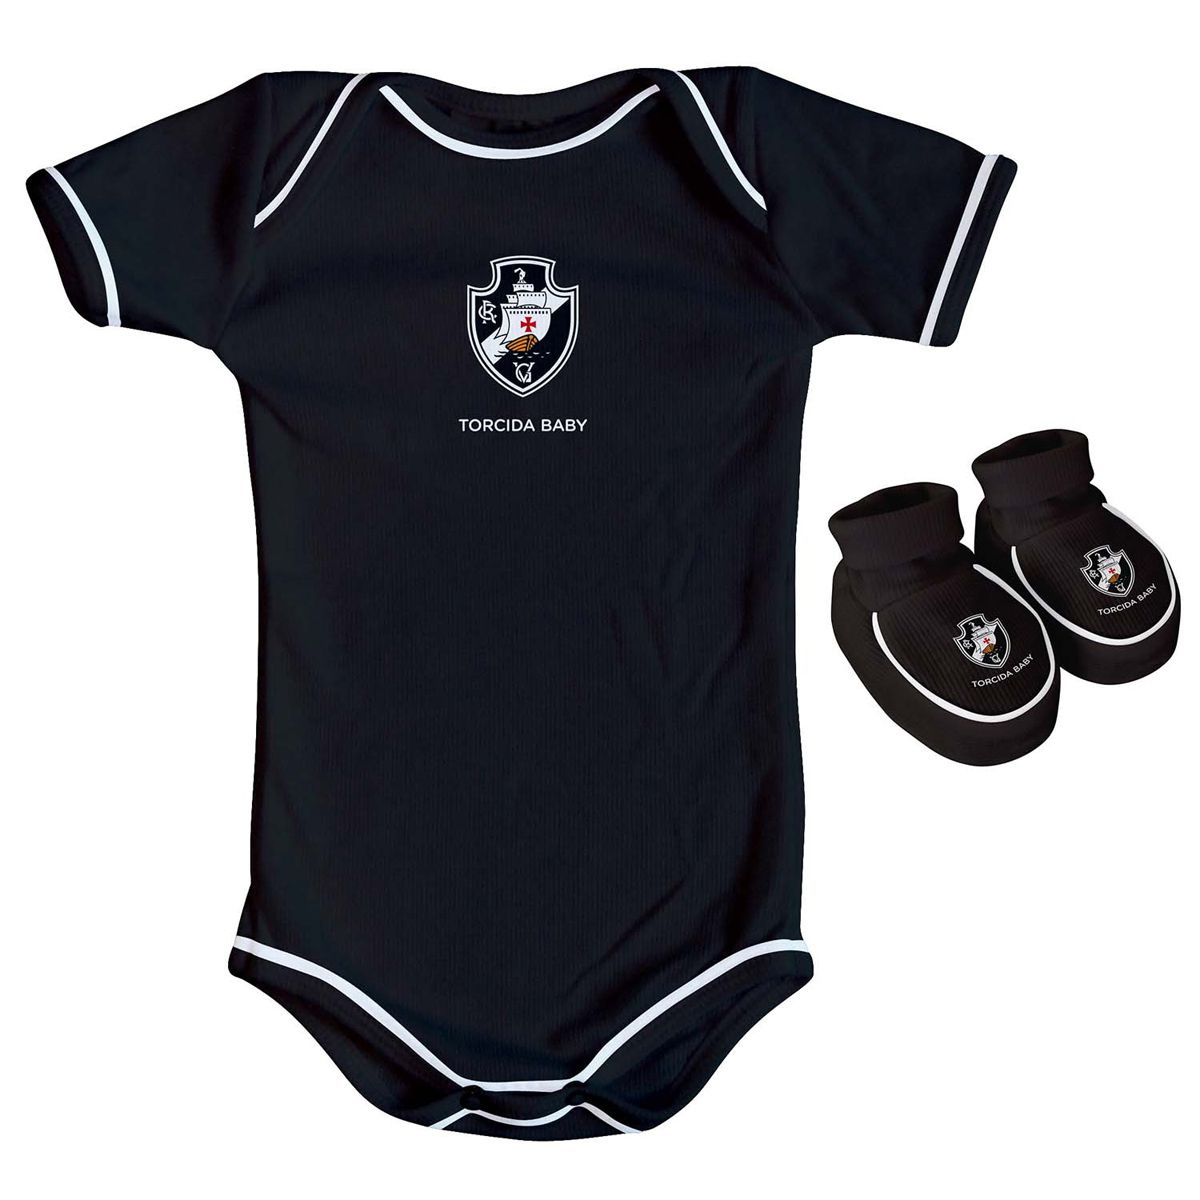 Kit Body + Pantufa para Bebê do Vasco da Gama